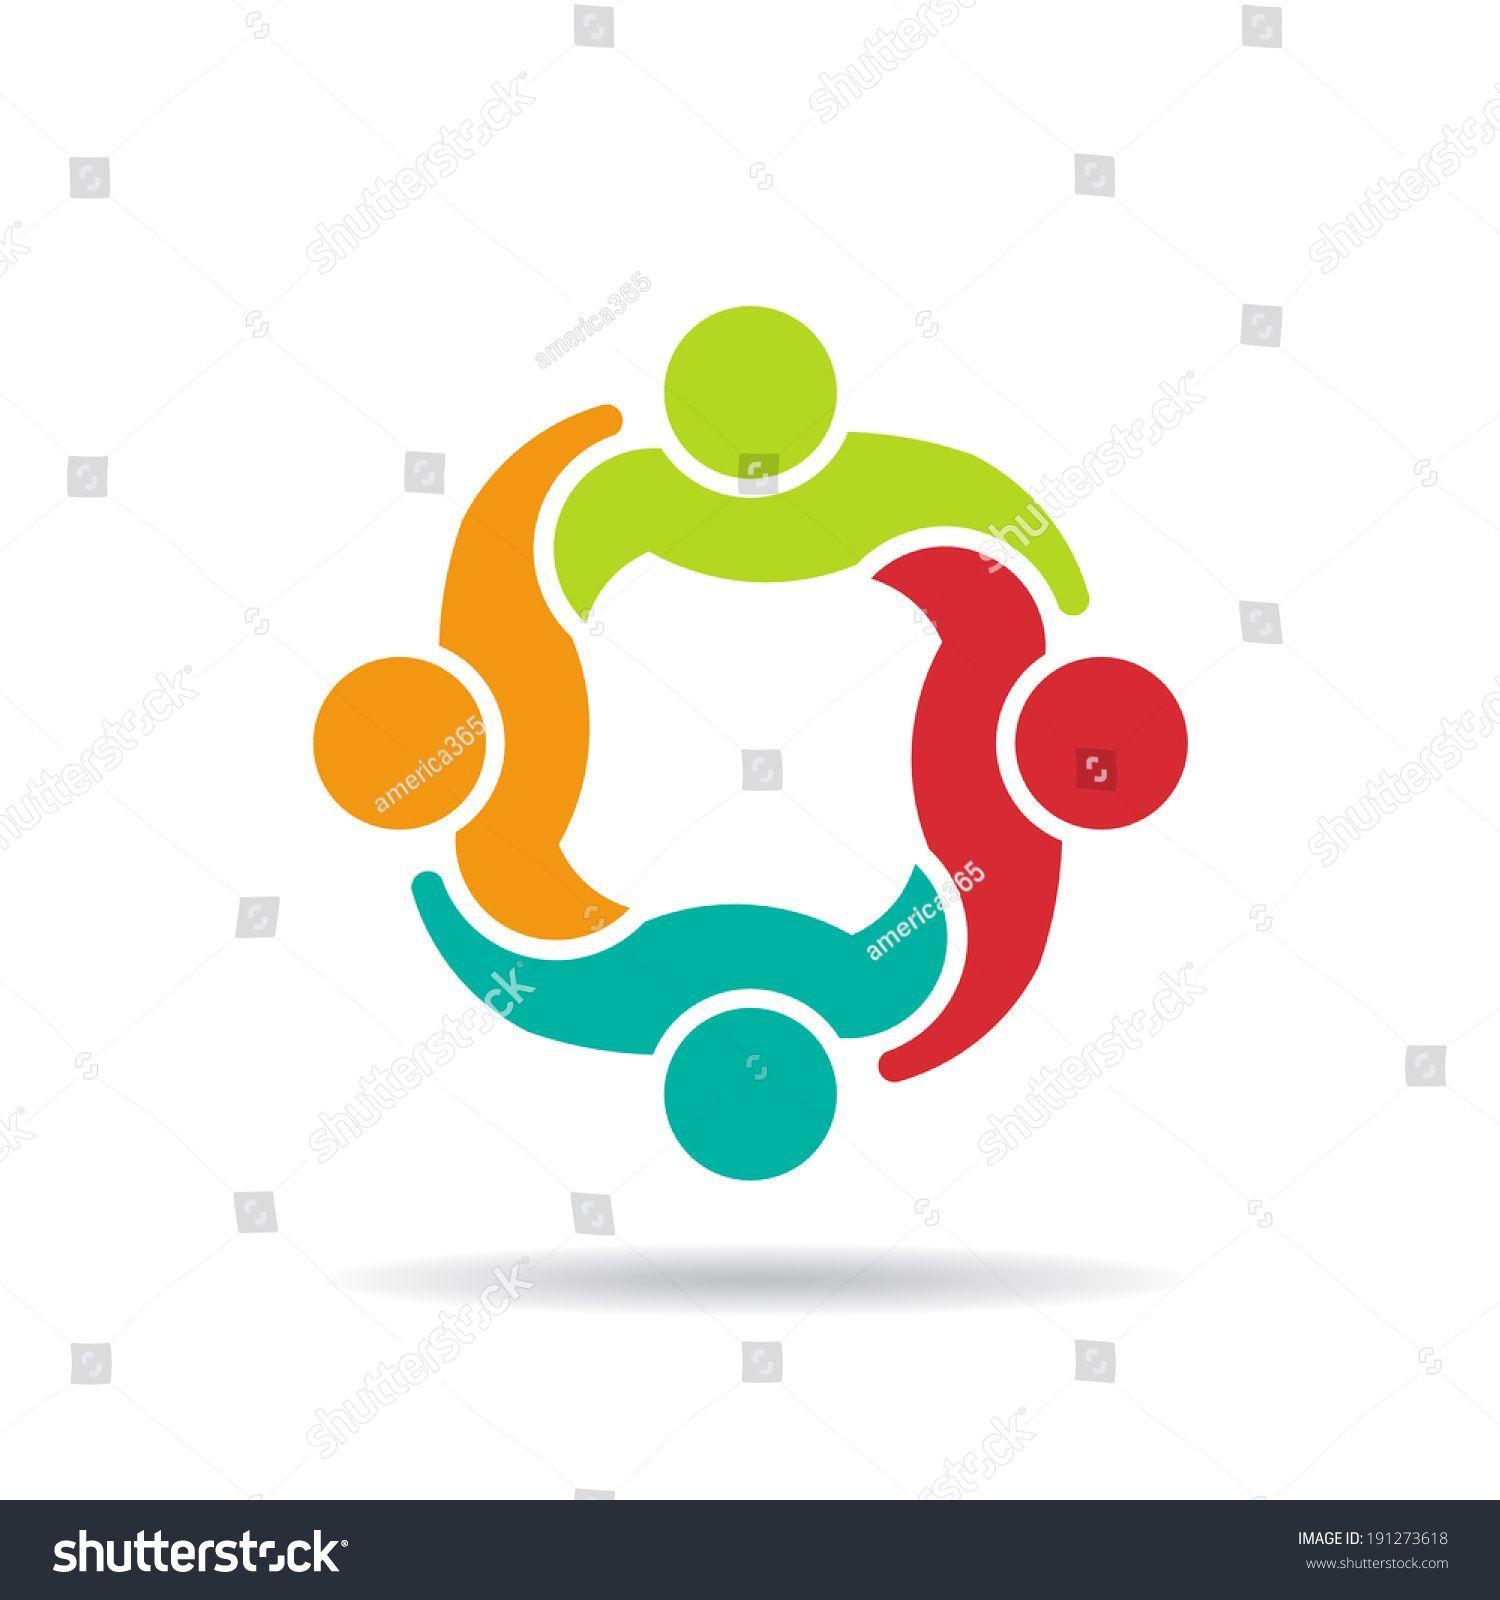 Team council concept of. Teamwork clipart group 4